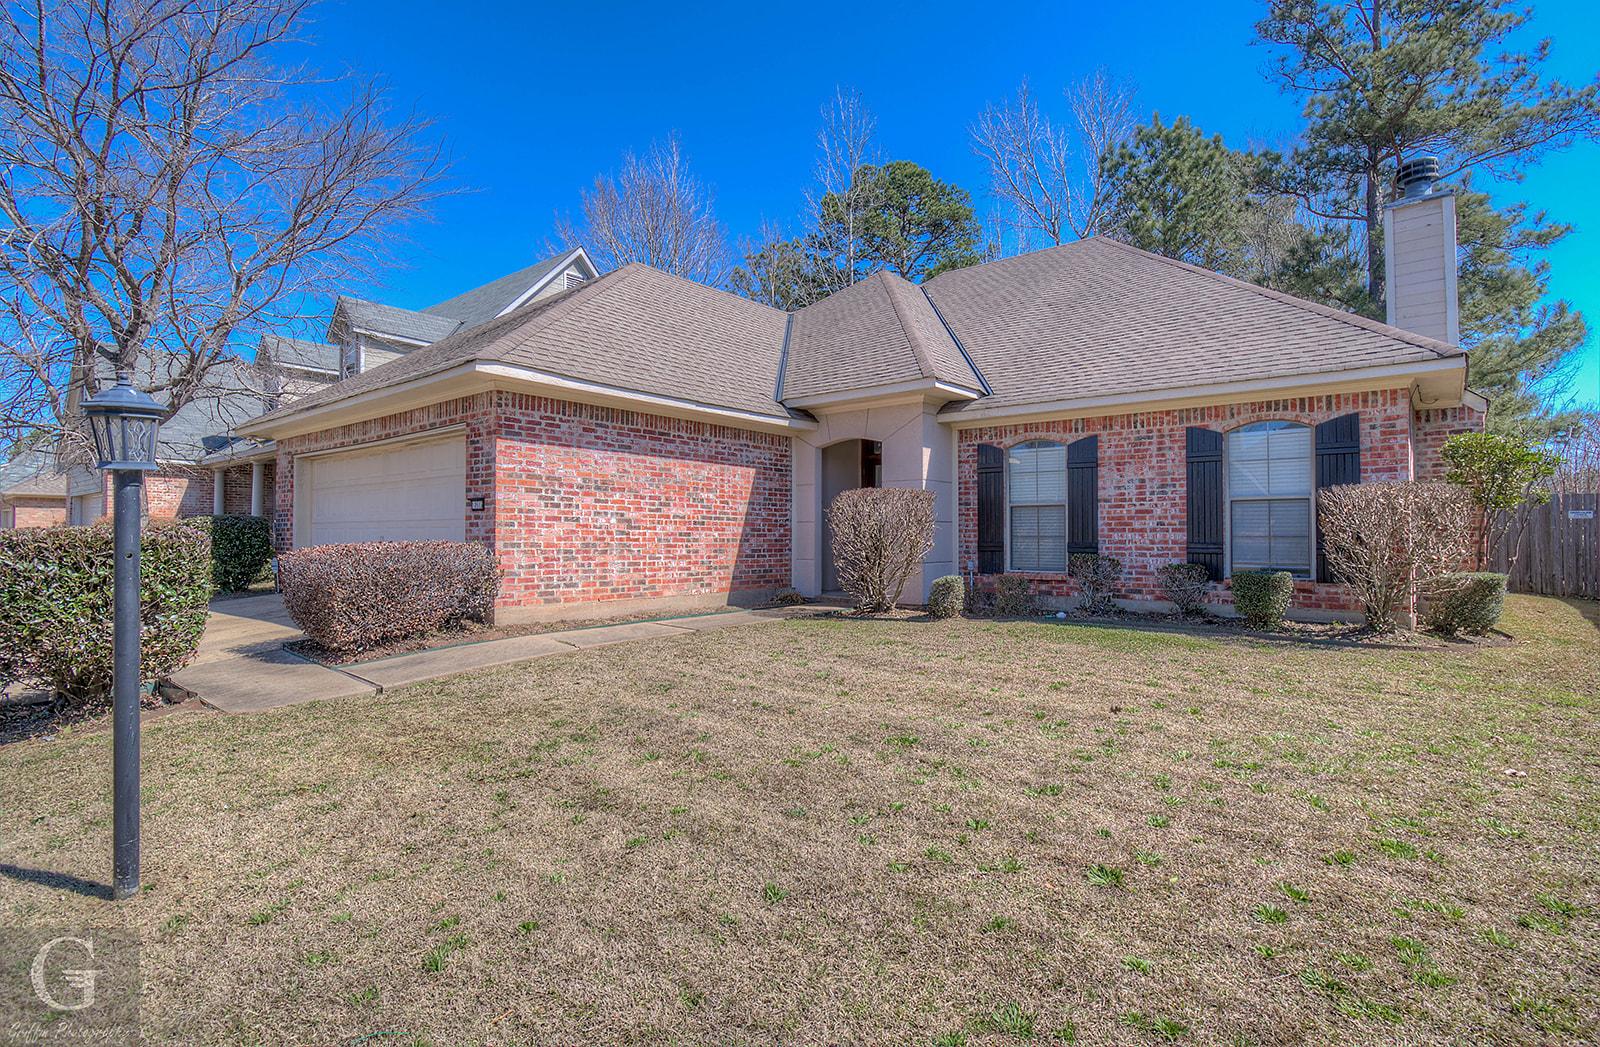 10513 Plum Creek Drive, Shreveport, Louisiana 71106, 3 Bedrooms Bedrooms, ,2 BathroomsBathrooms,Single Family,For Sale,10513 Plum Creek Drive,1,280377